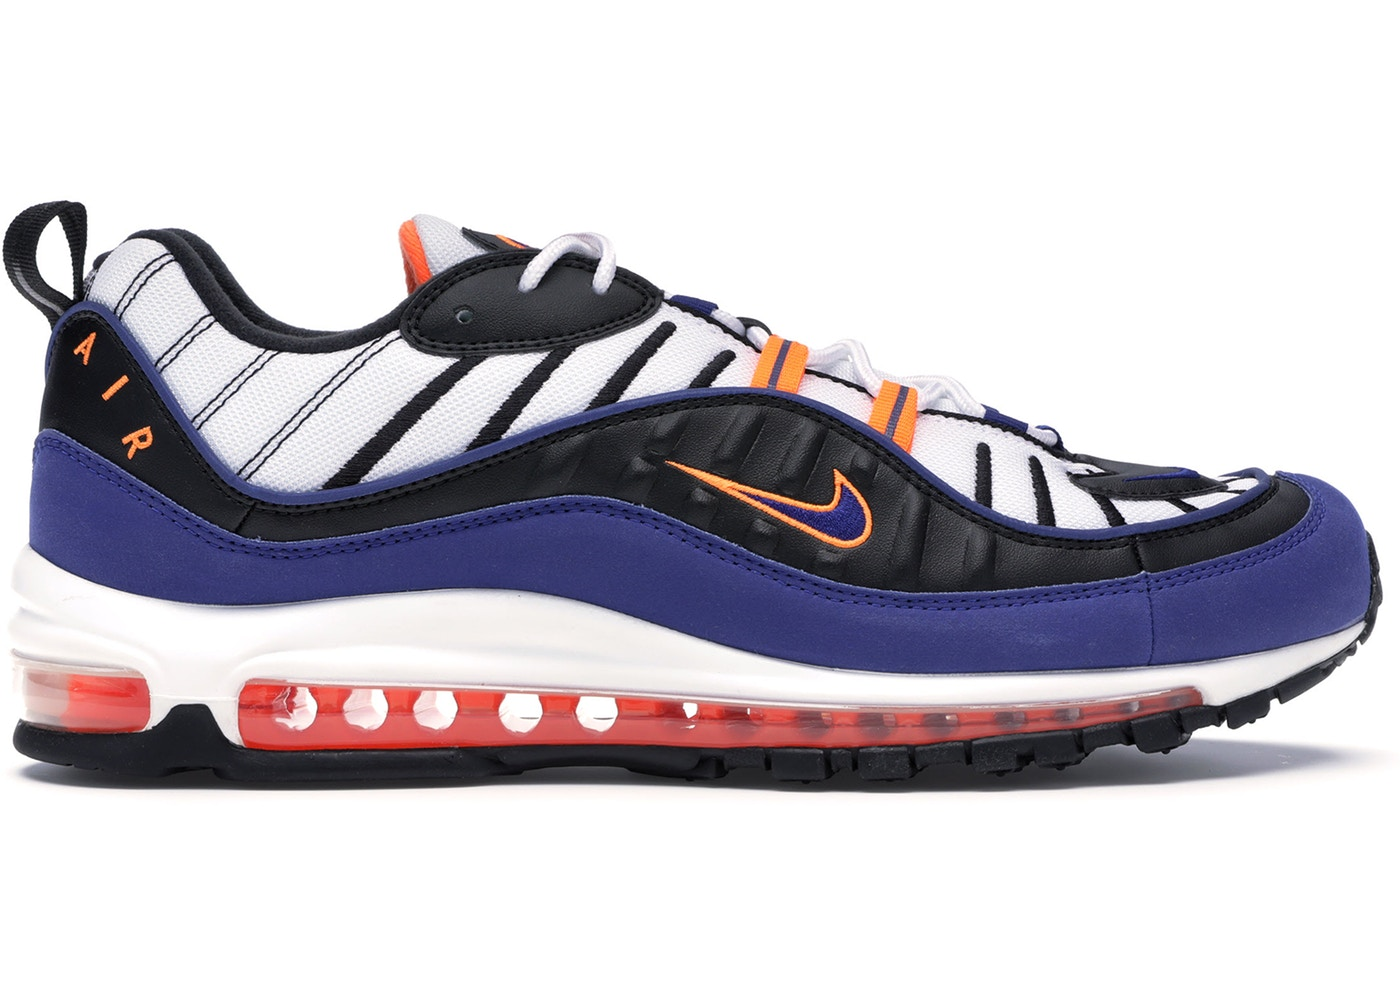 sale retailer 216fa 32bac On Sale: Nike Air Max 98